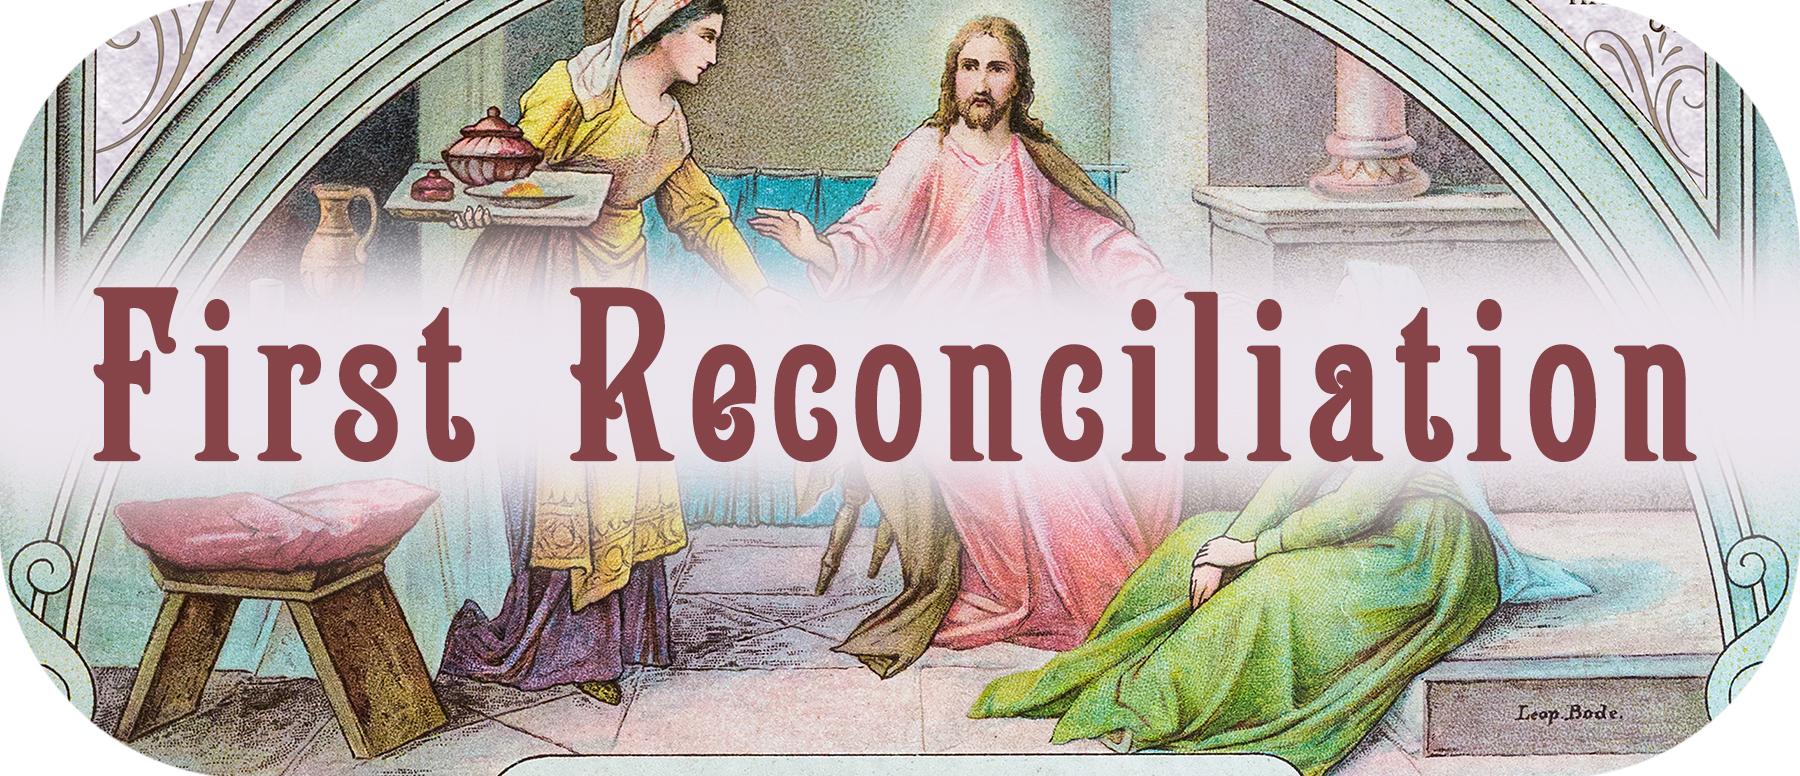 first-reconciliation-button.jpg